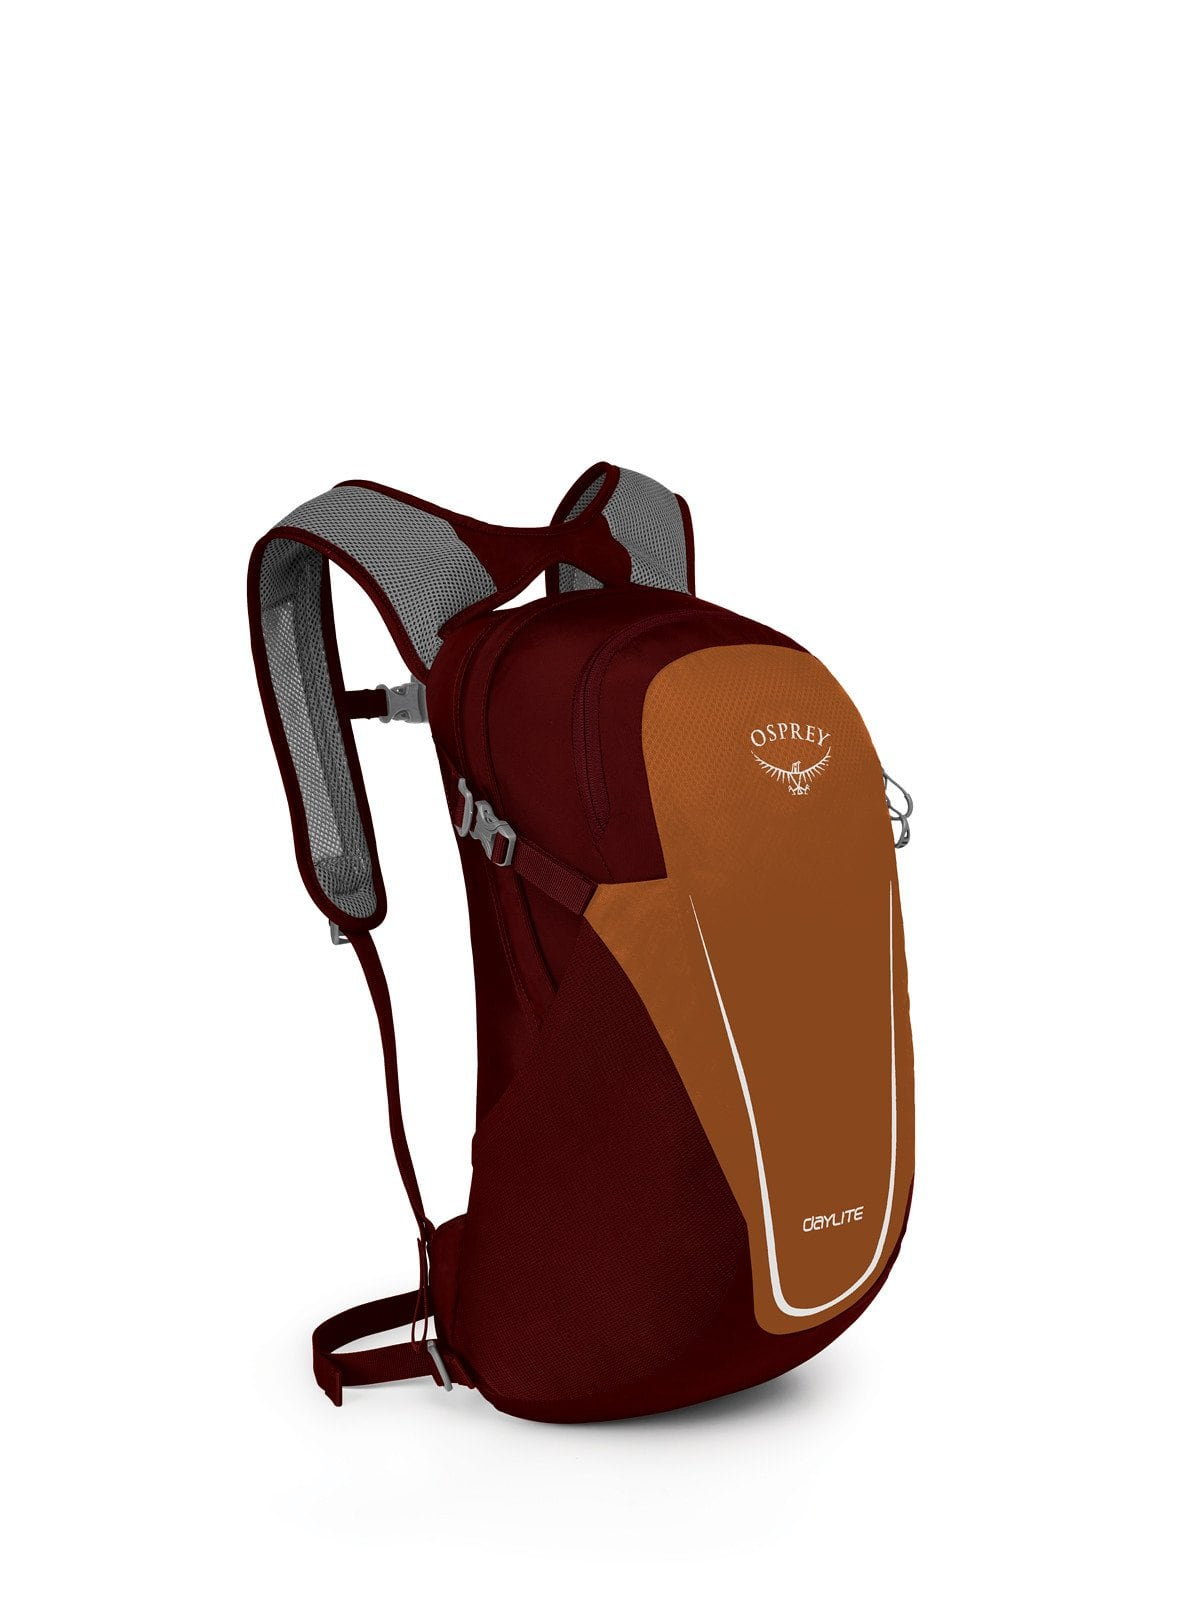 Osprey Daylite Daypack (Magma Orange-Real Red) $24.50